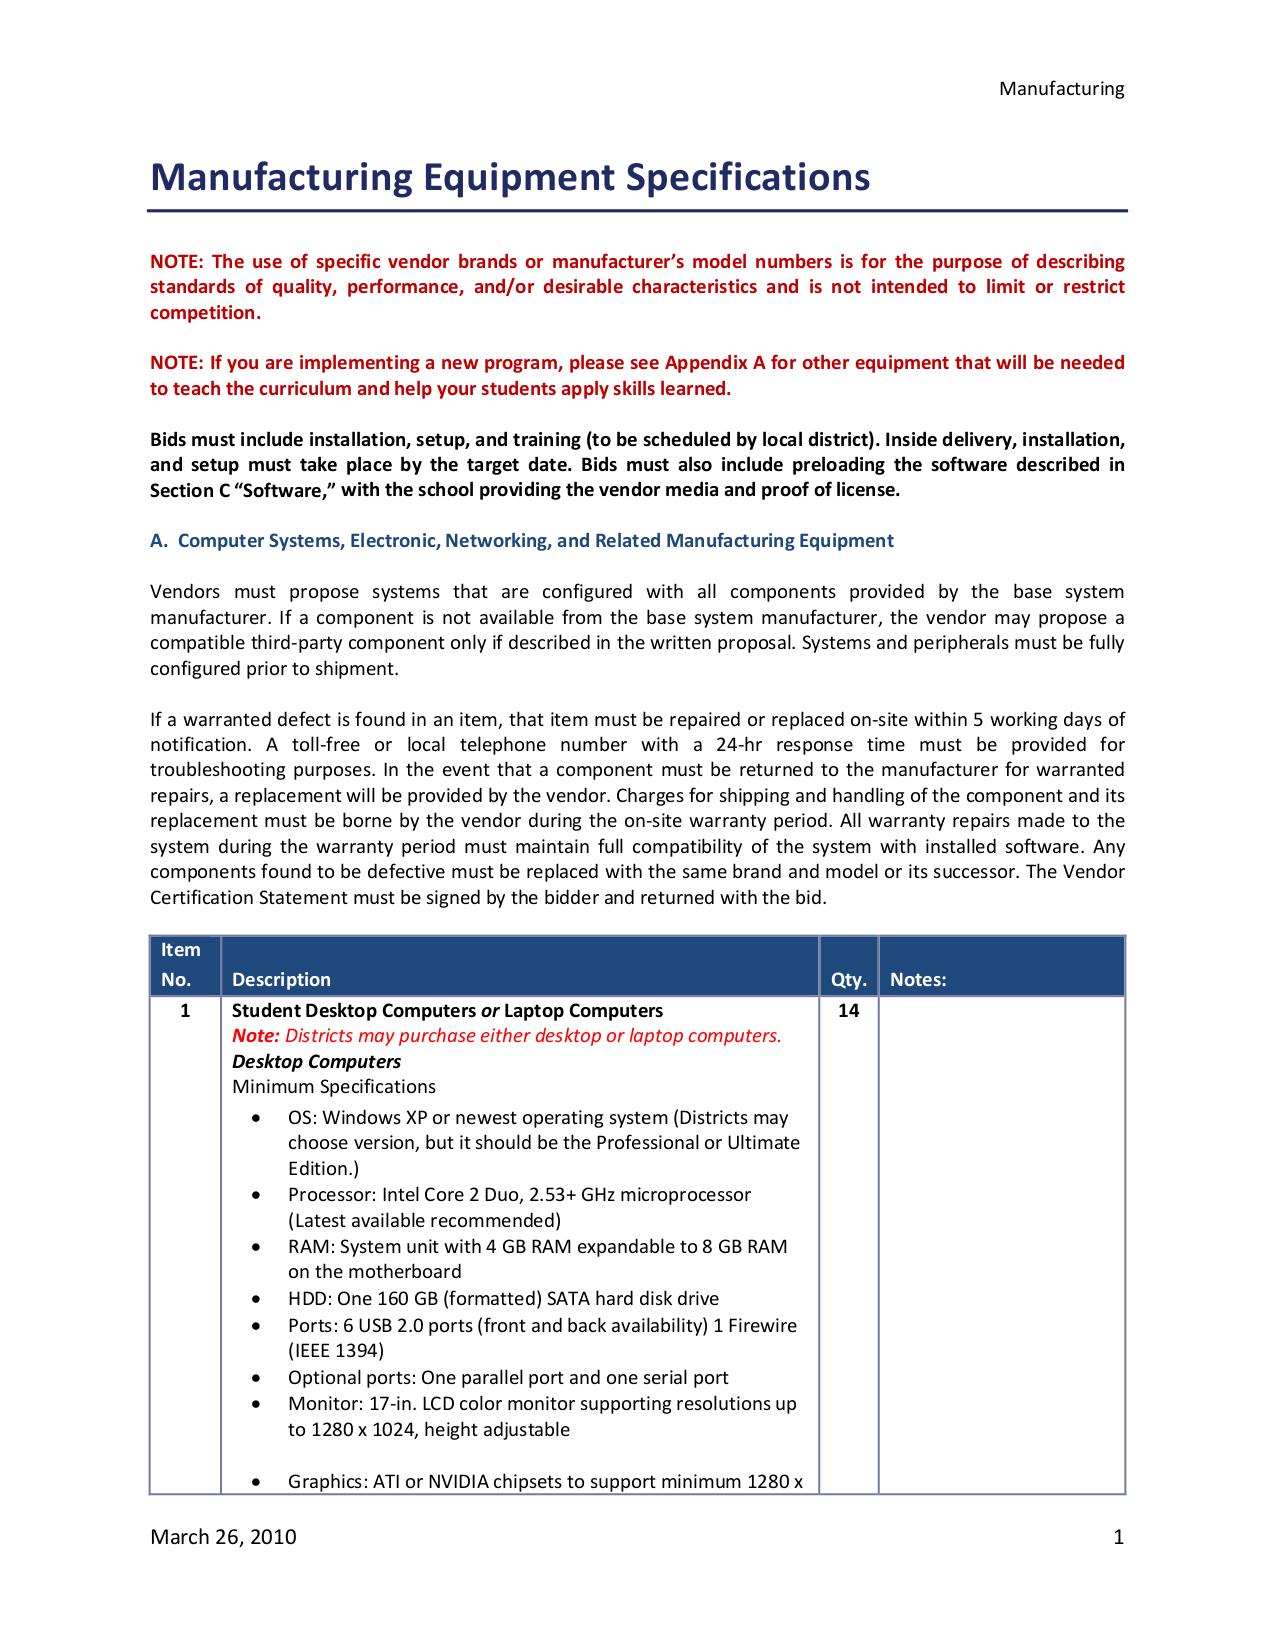 fabrication formula pdf free download